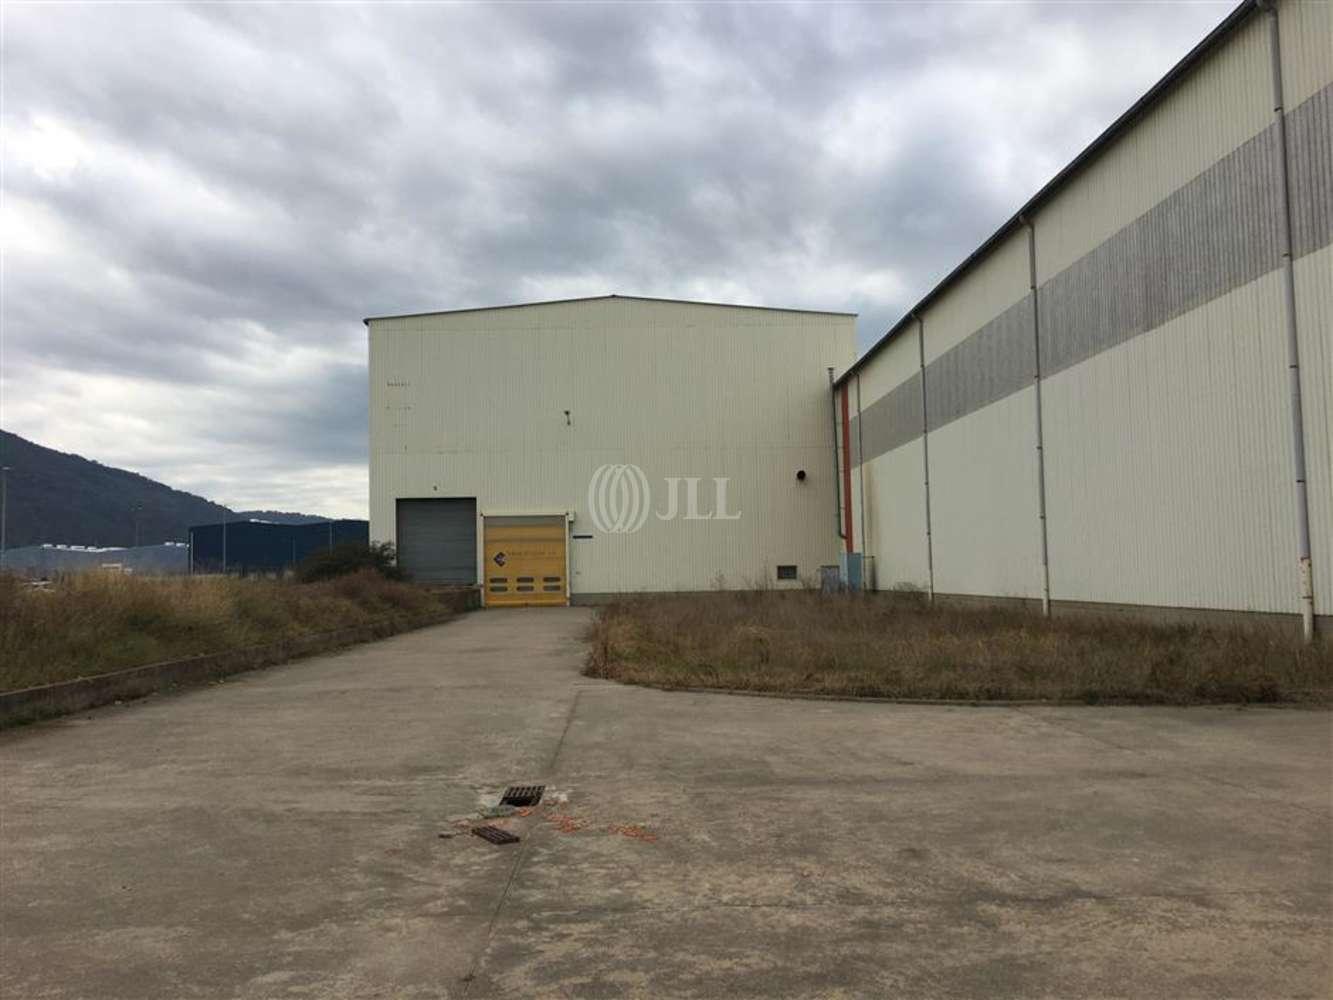 Naves industriales y logísticas Celrà, 17460 - Nave Industrial - B0455 - P.I CELRÀ - 9382